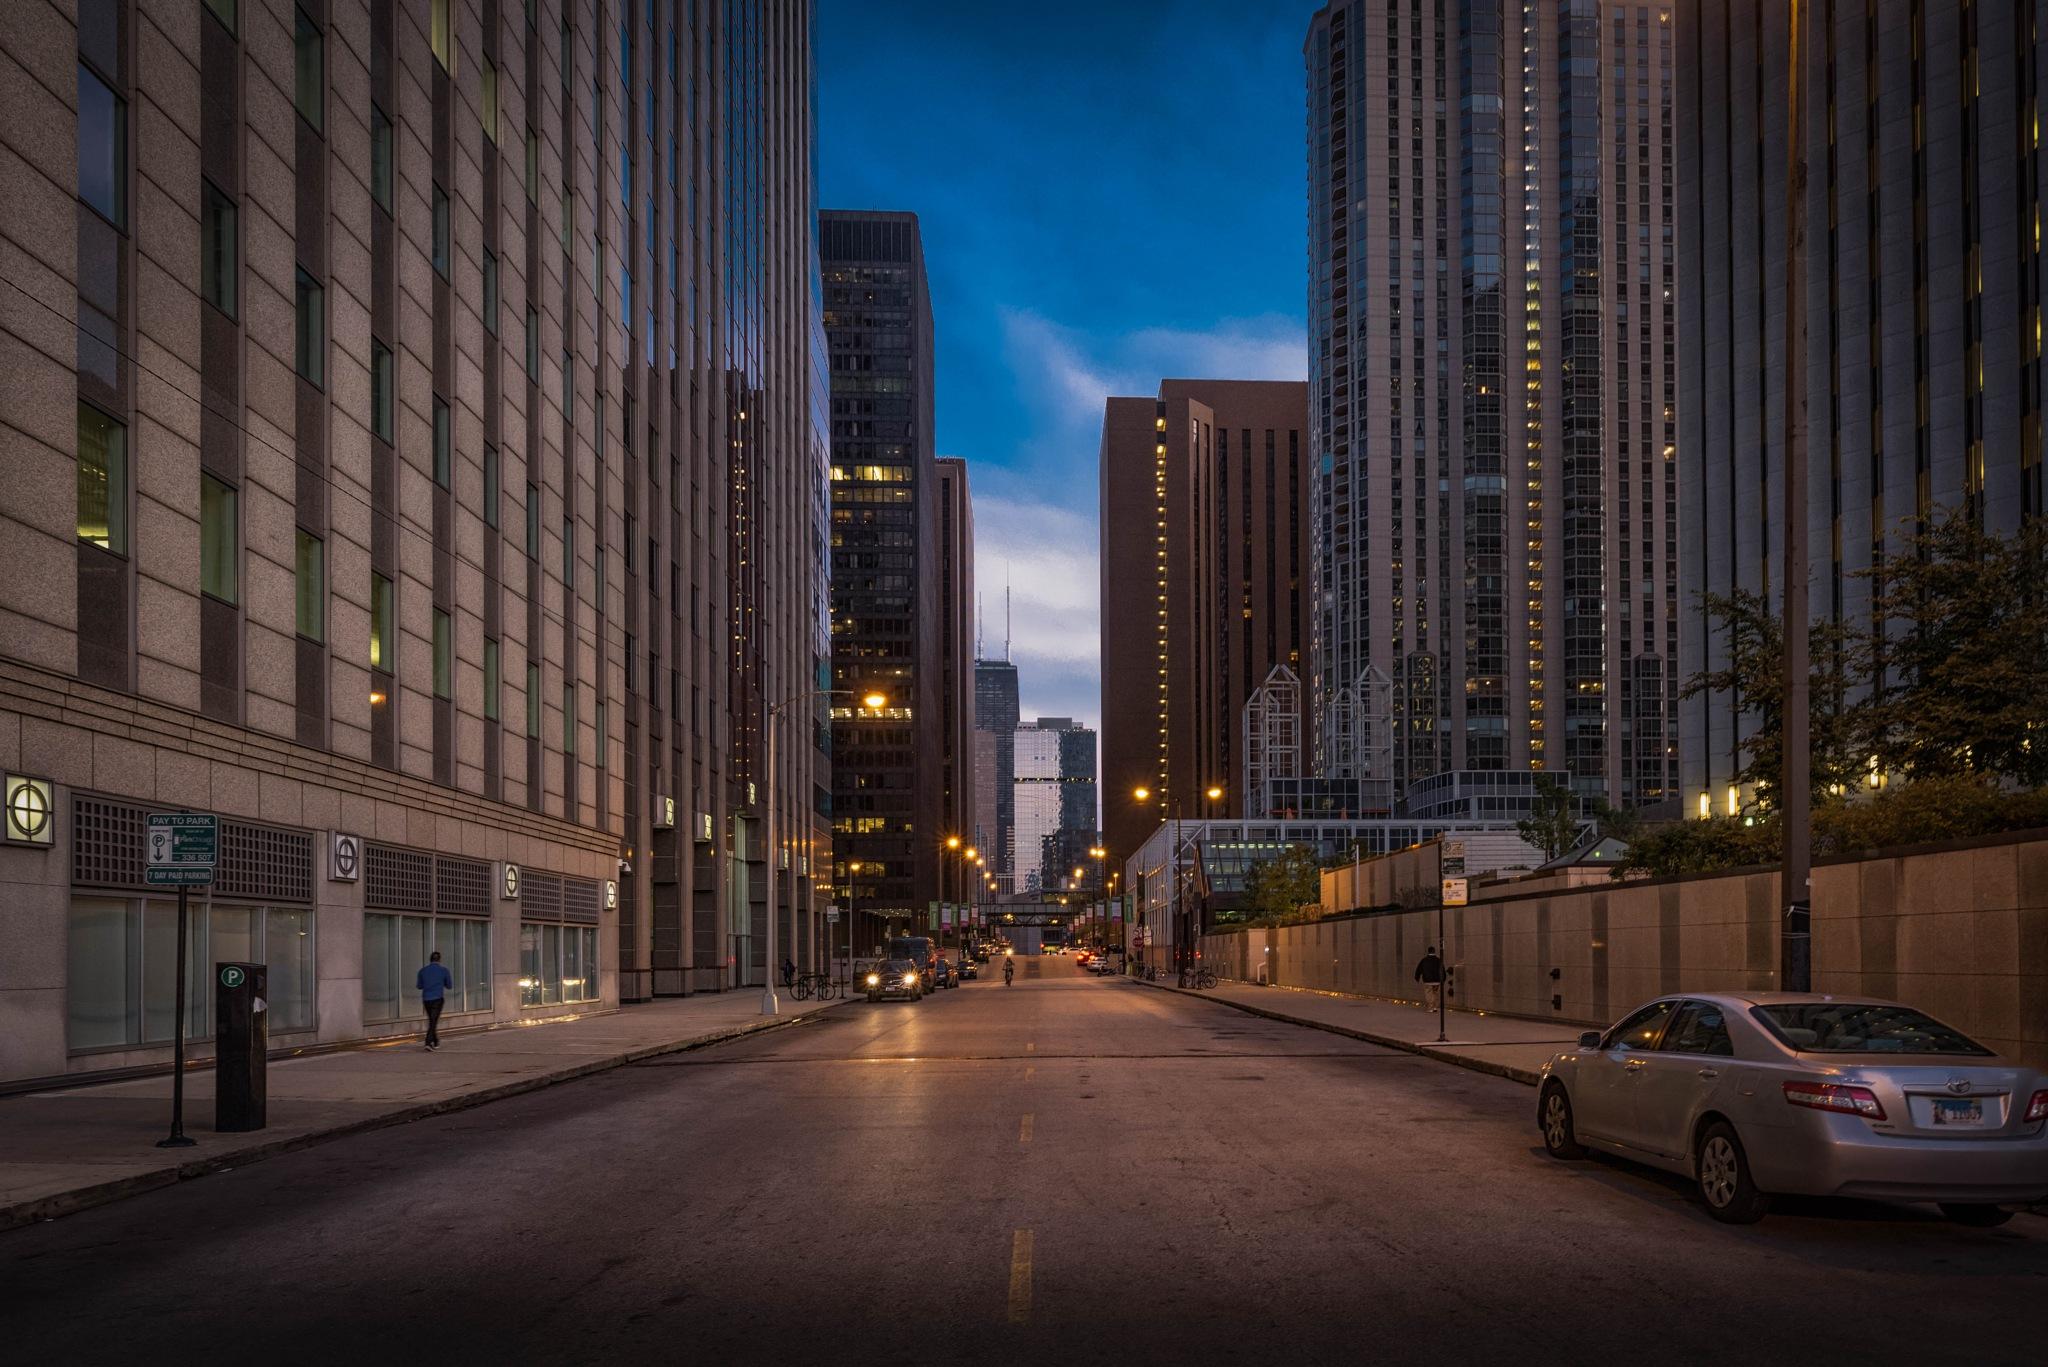 A City Waking Up by Kevin Drew Davis